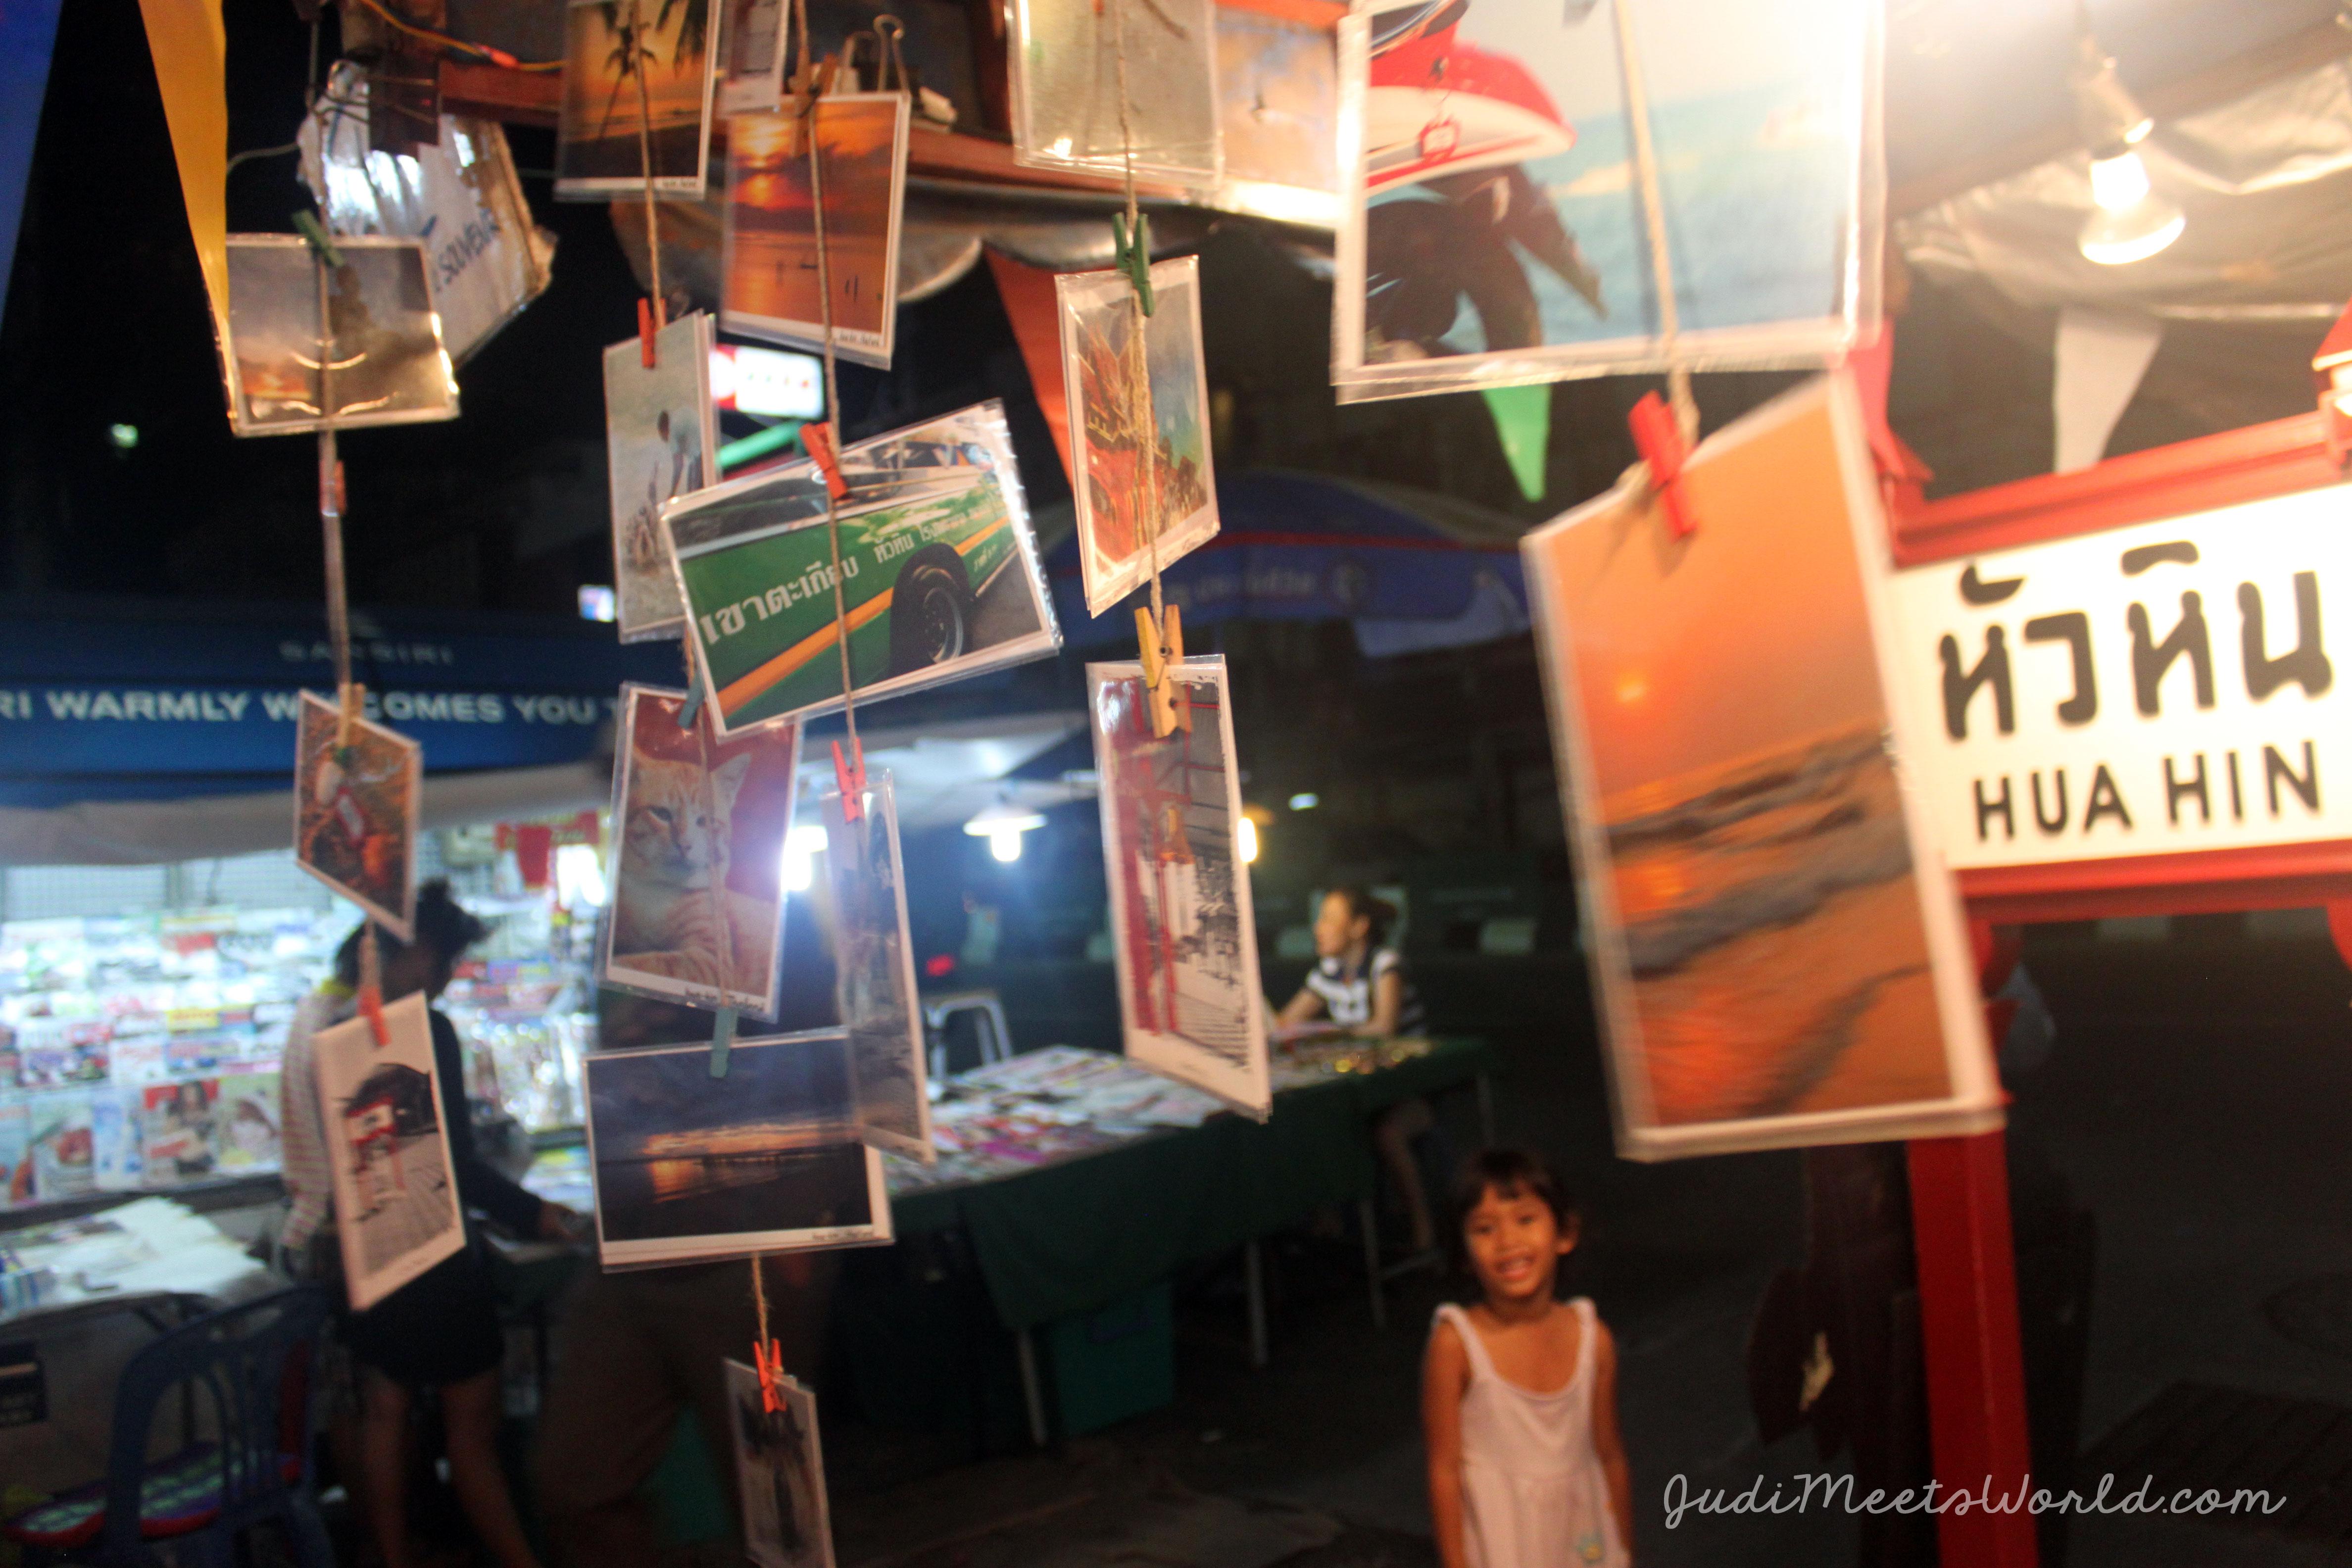 Meet Hua Hin, Bangkok, Thailand - judimeetsworld